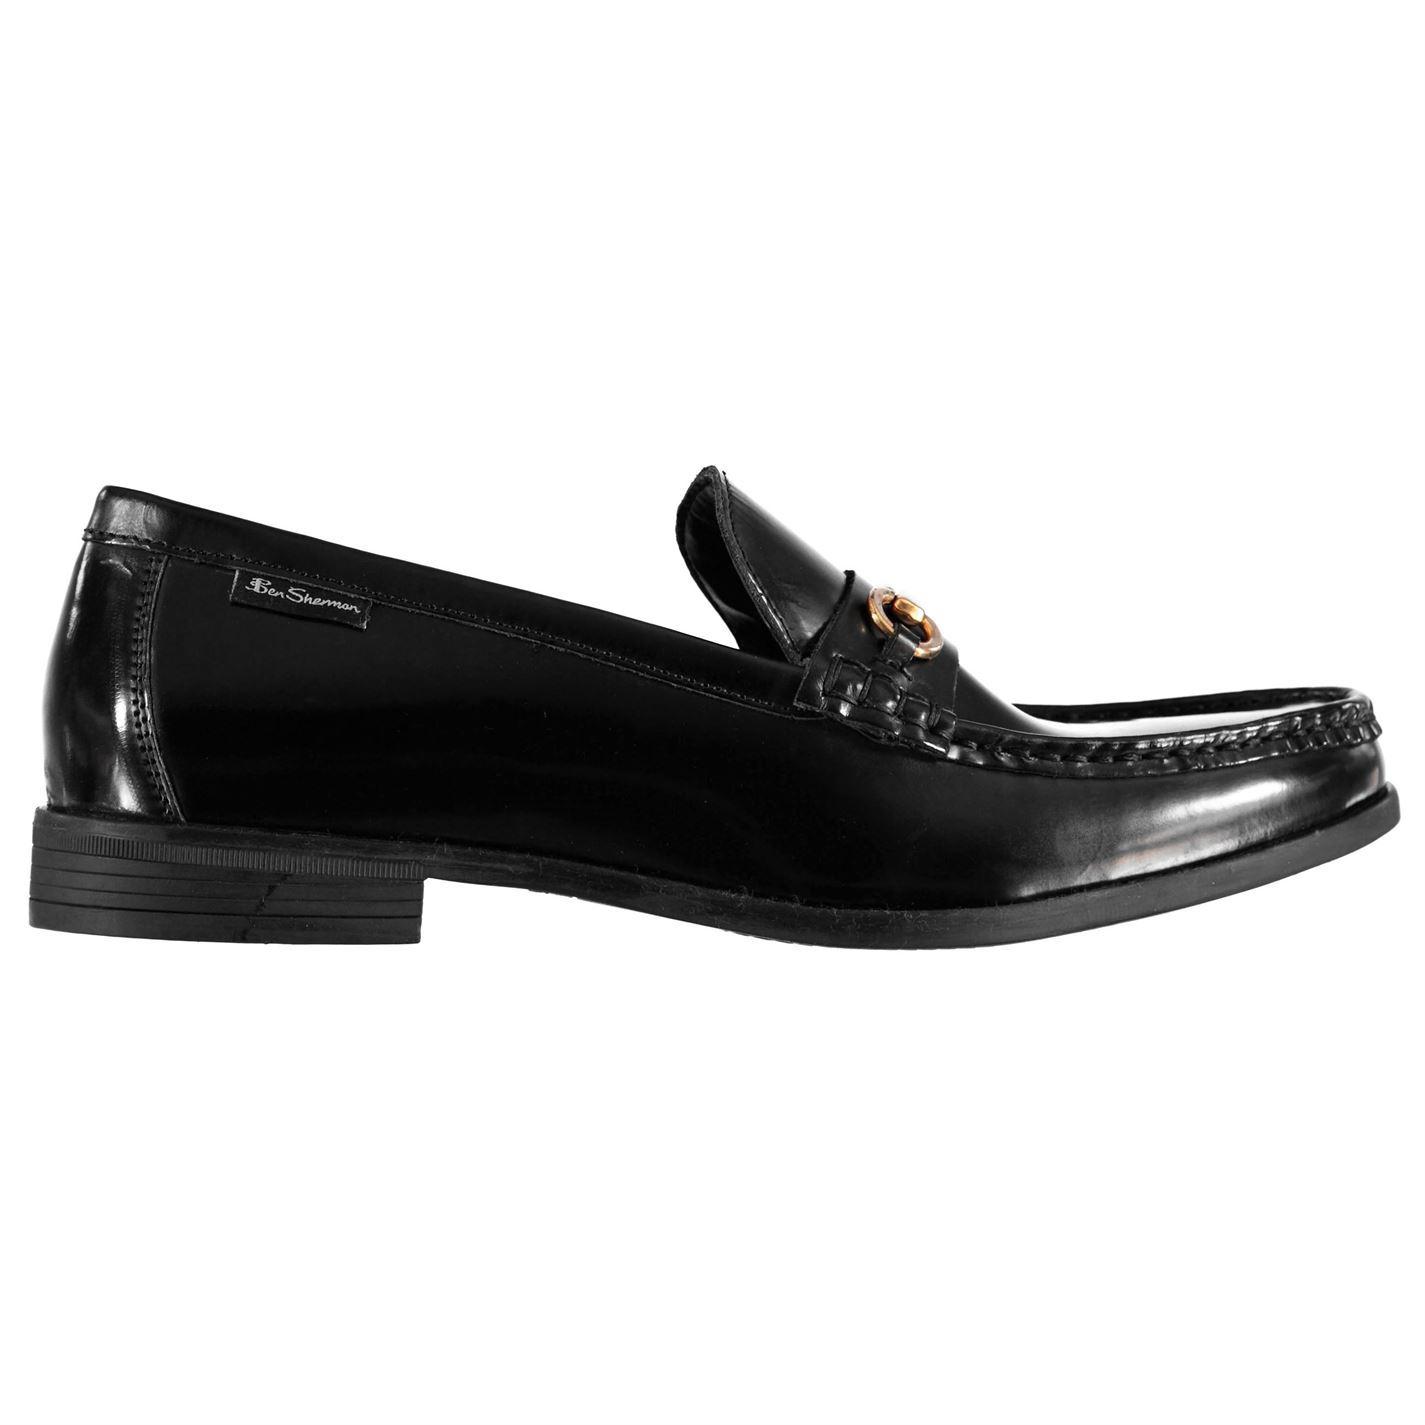 Ben-Sherman-Luca-Loafers-Slip-On-Shoes-Mens-Formal-Footwear-Flats thumbnail 4